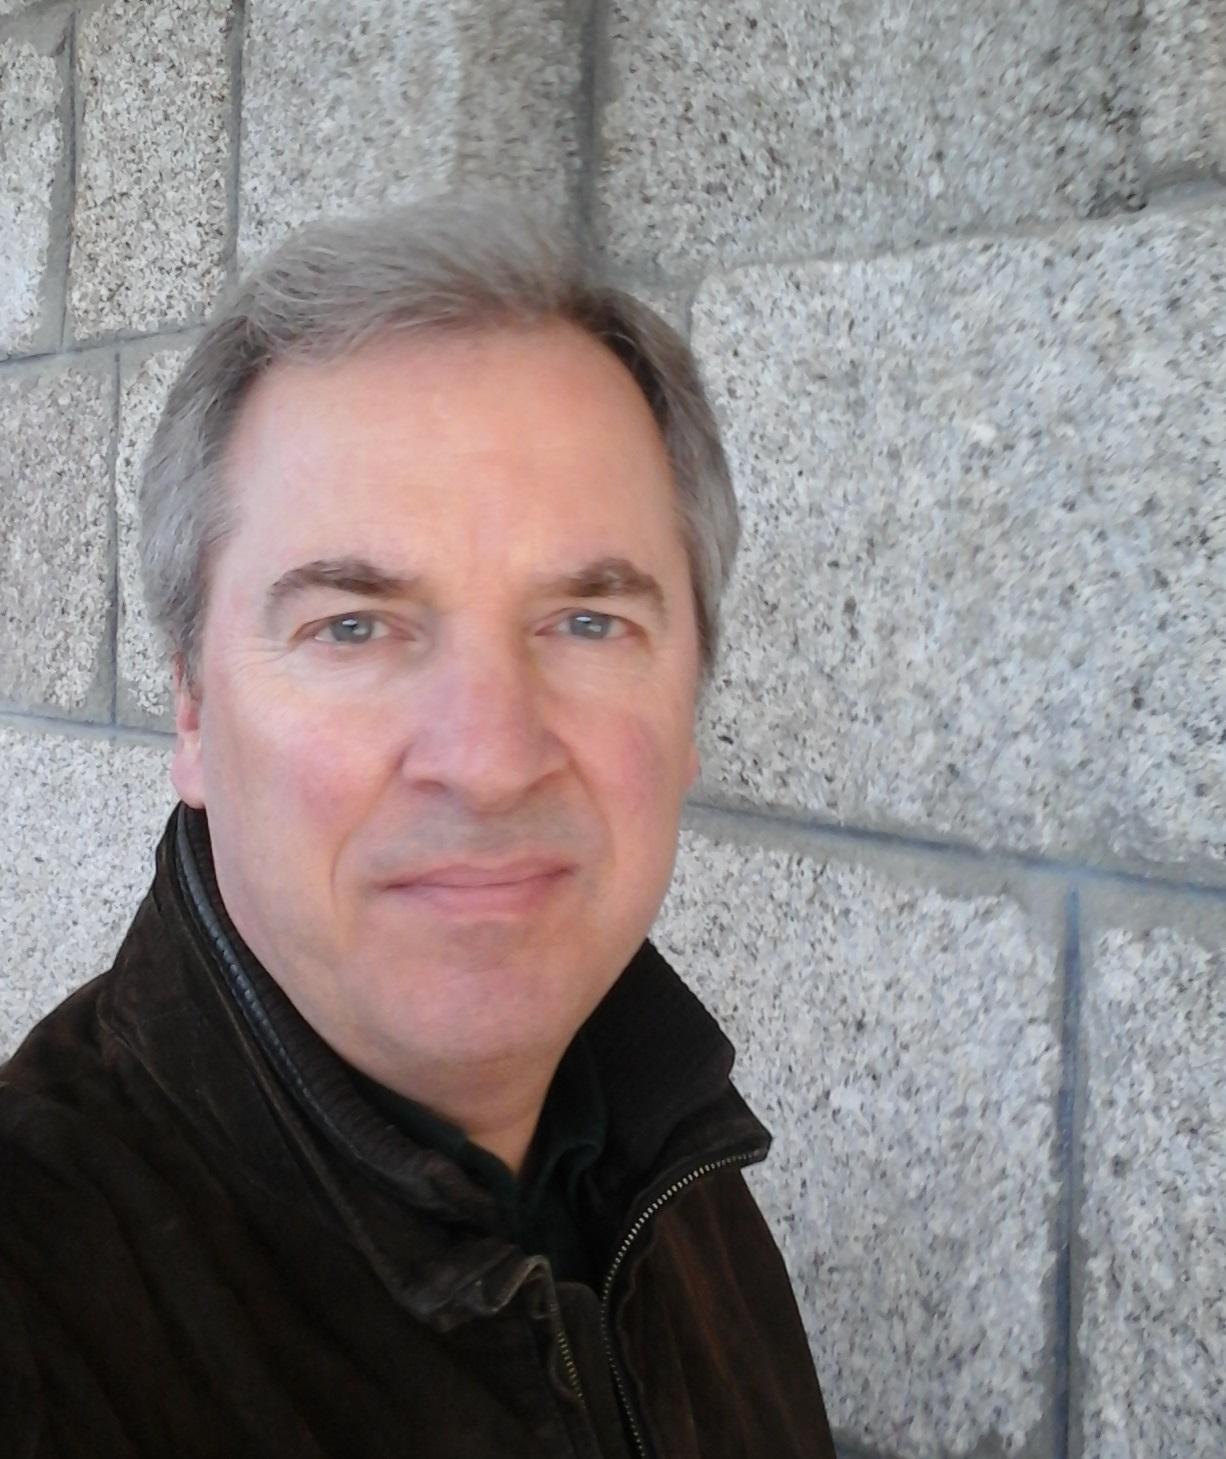 Philip Kraske